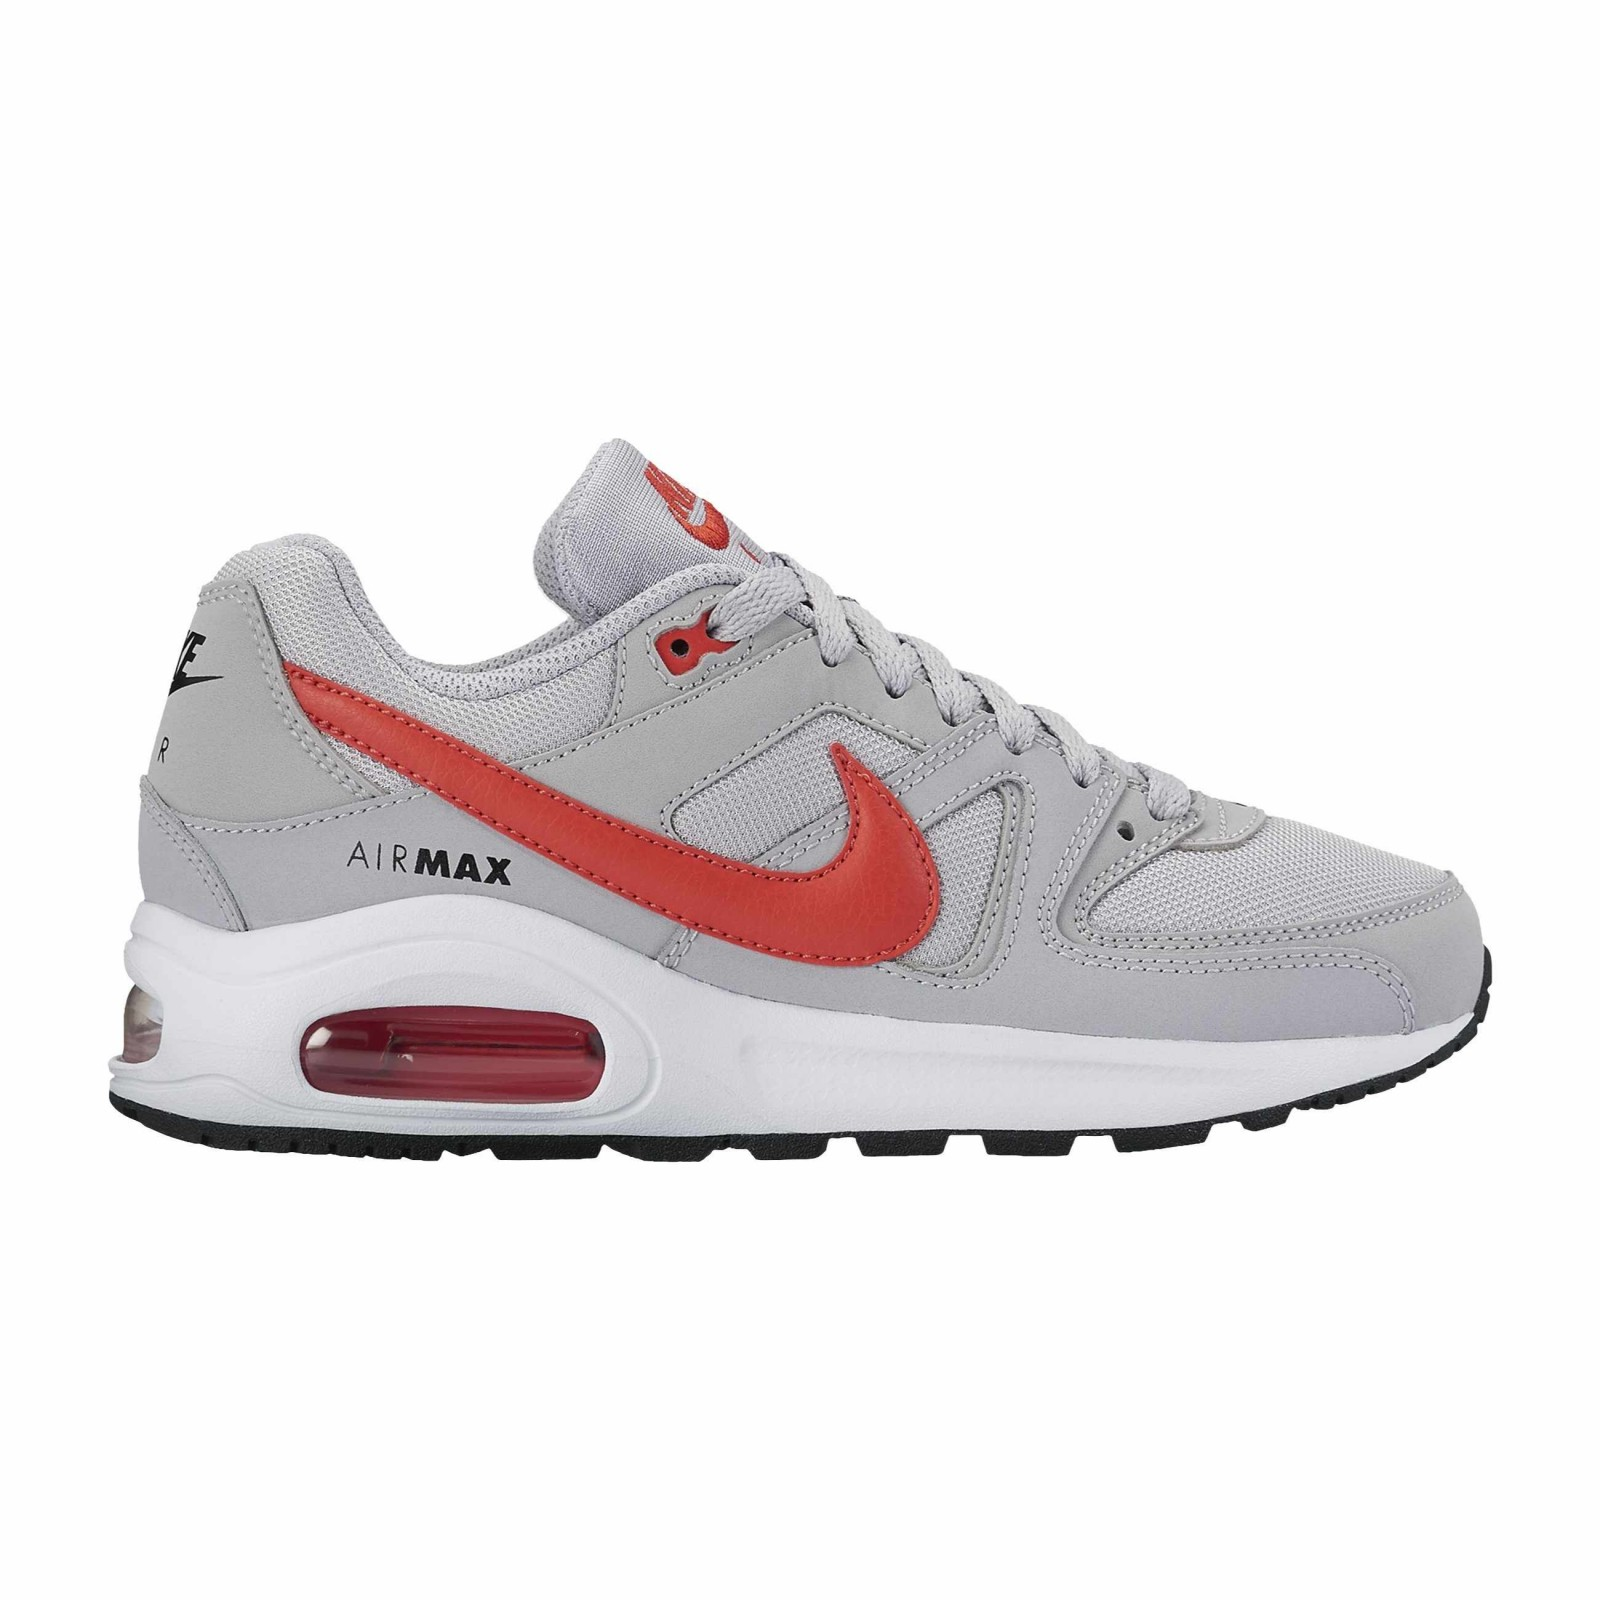 Dětské tenisky Nike AIR MAX COMMAND FLEX (GS)  9230c144dbf